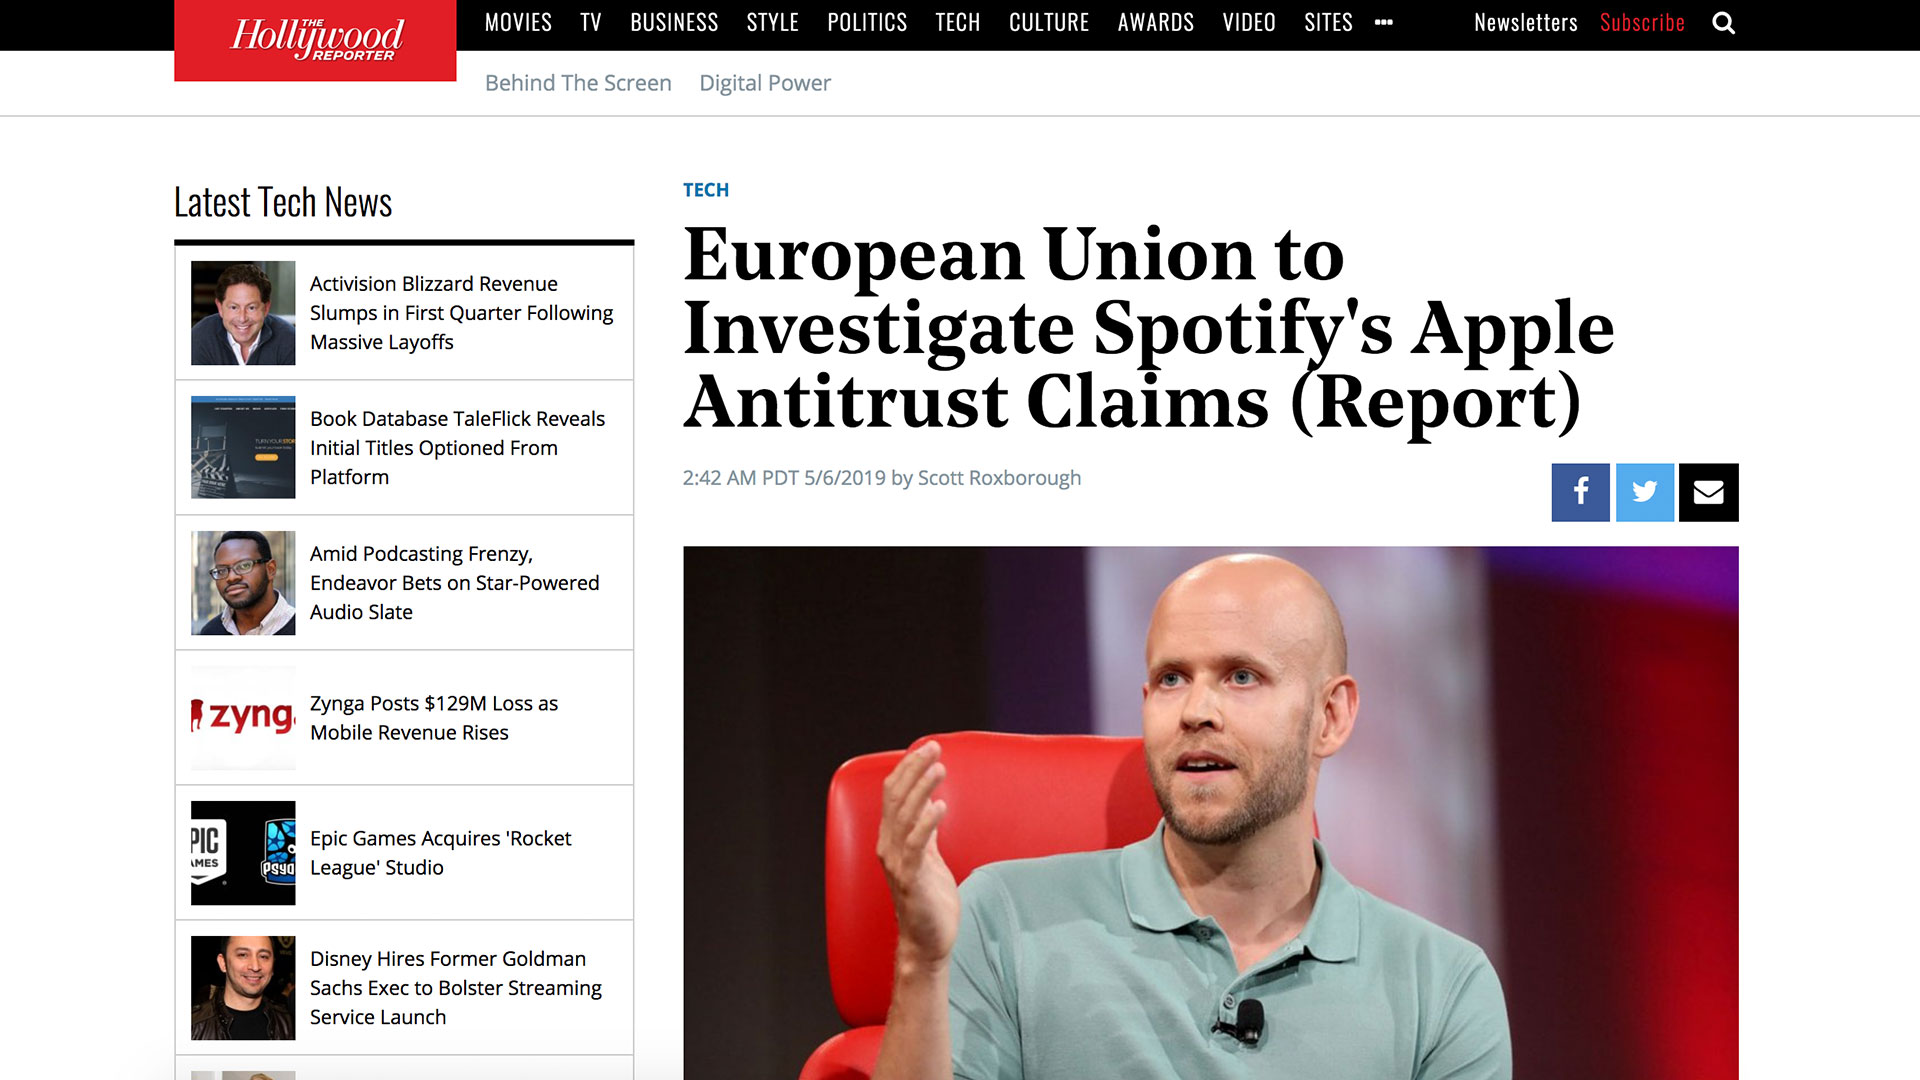 Fairness Rocks News European Union to Investigate Spotify's Apple Antitrust Claims (Report)